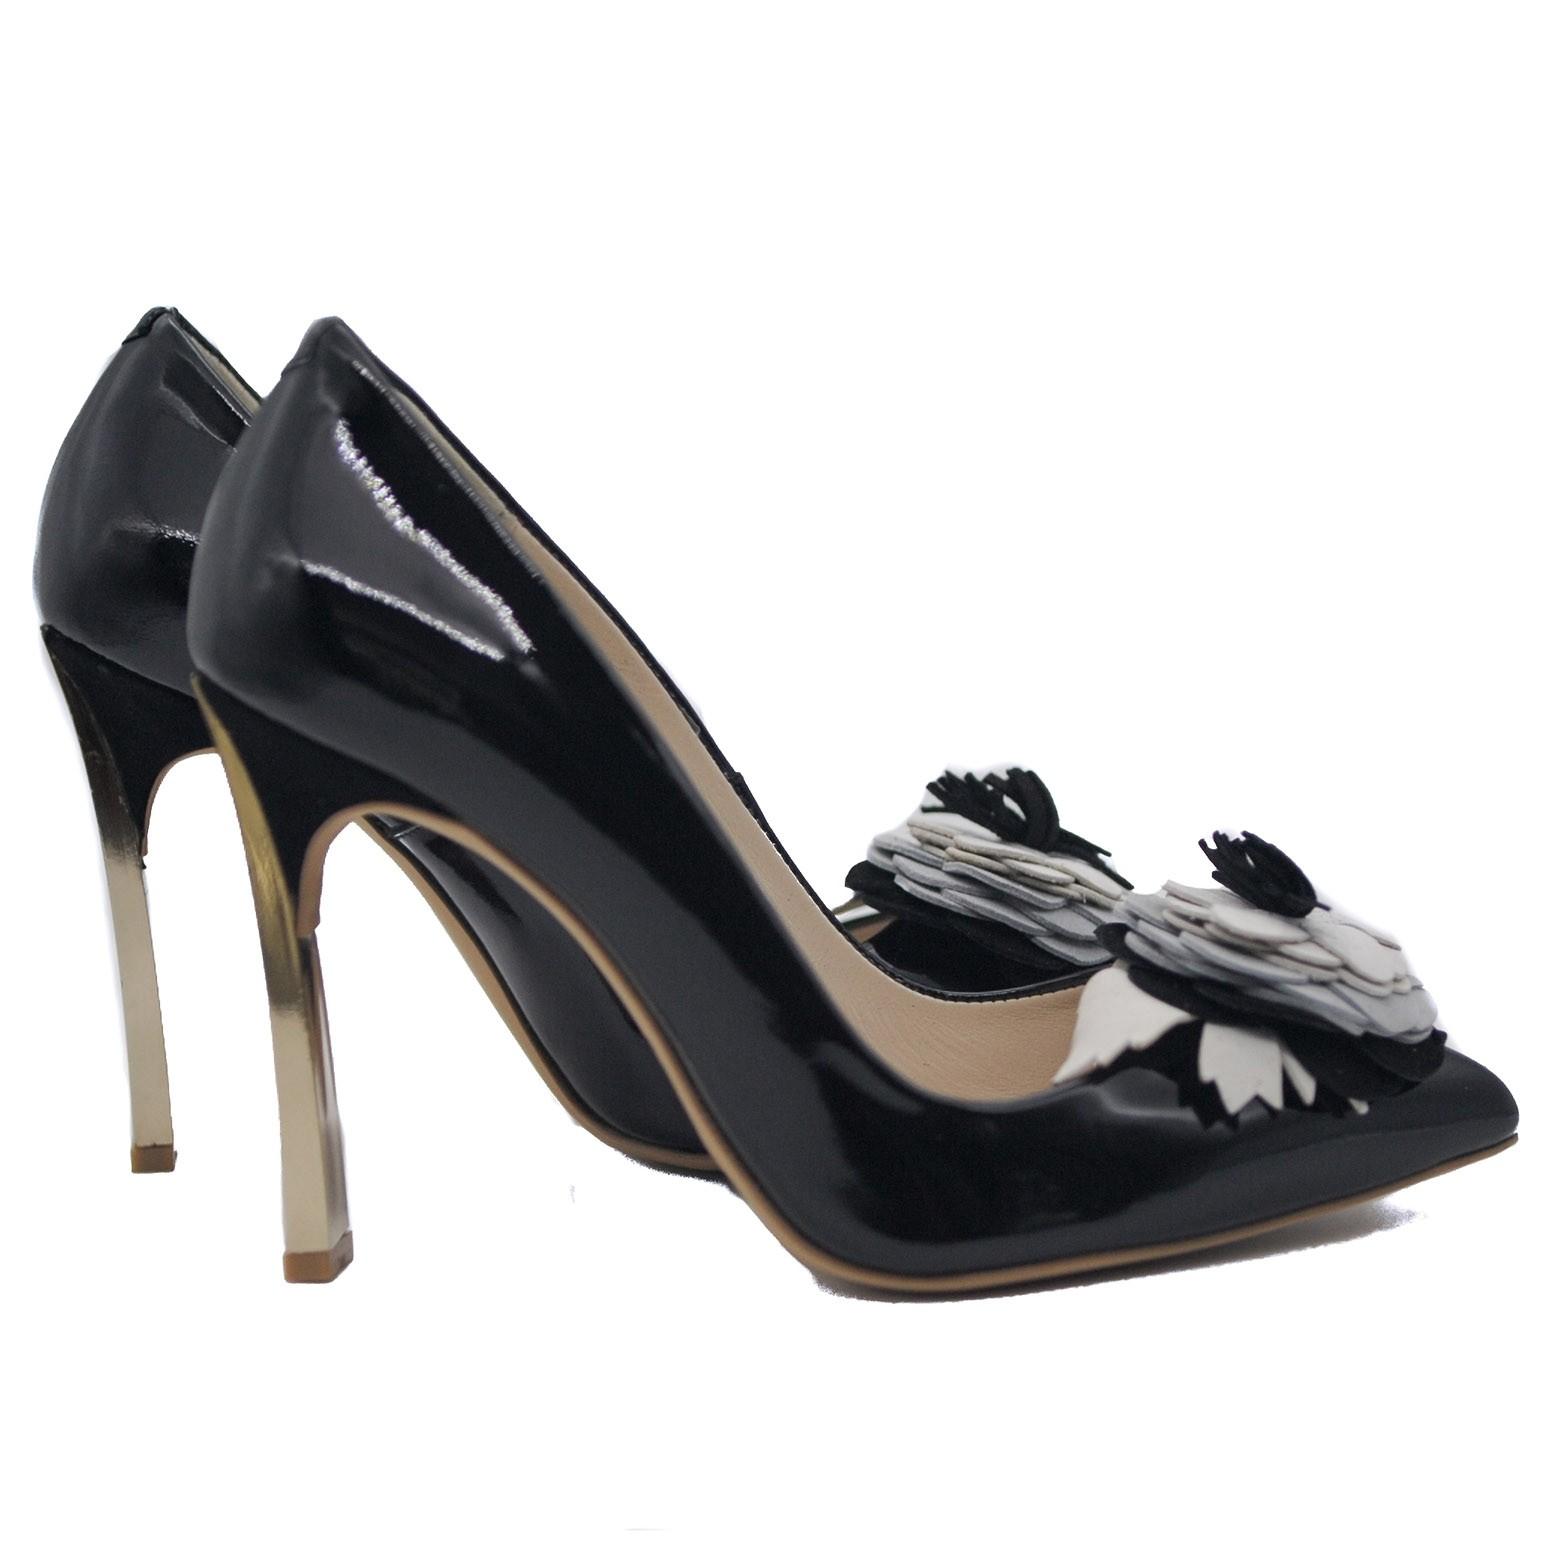 Goody2Shoes Ladies' Metallic Block Heel Black Patent Court Shoe with Suede Flower